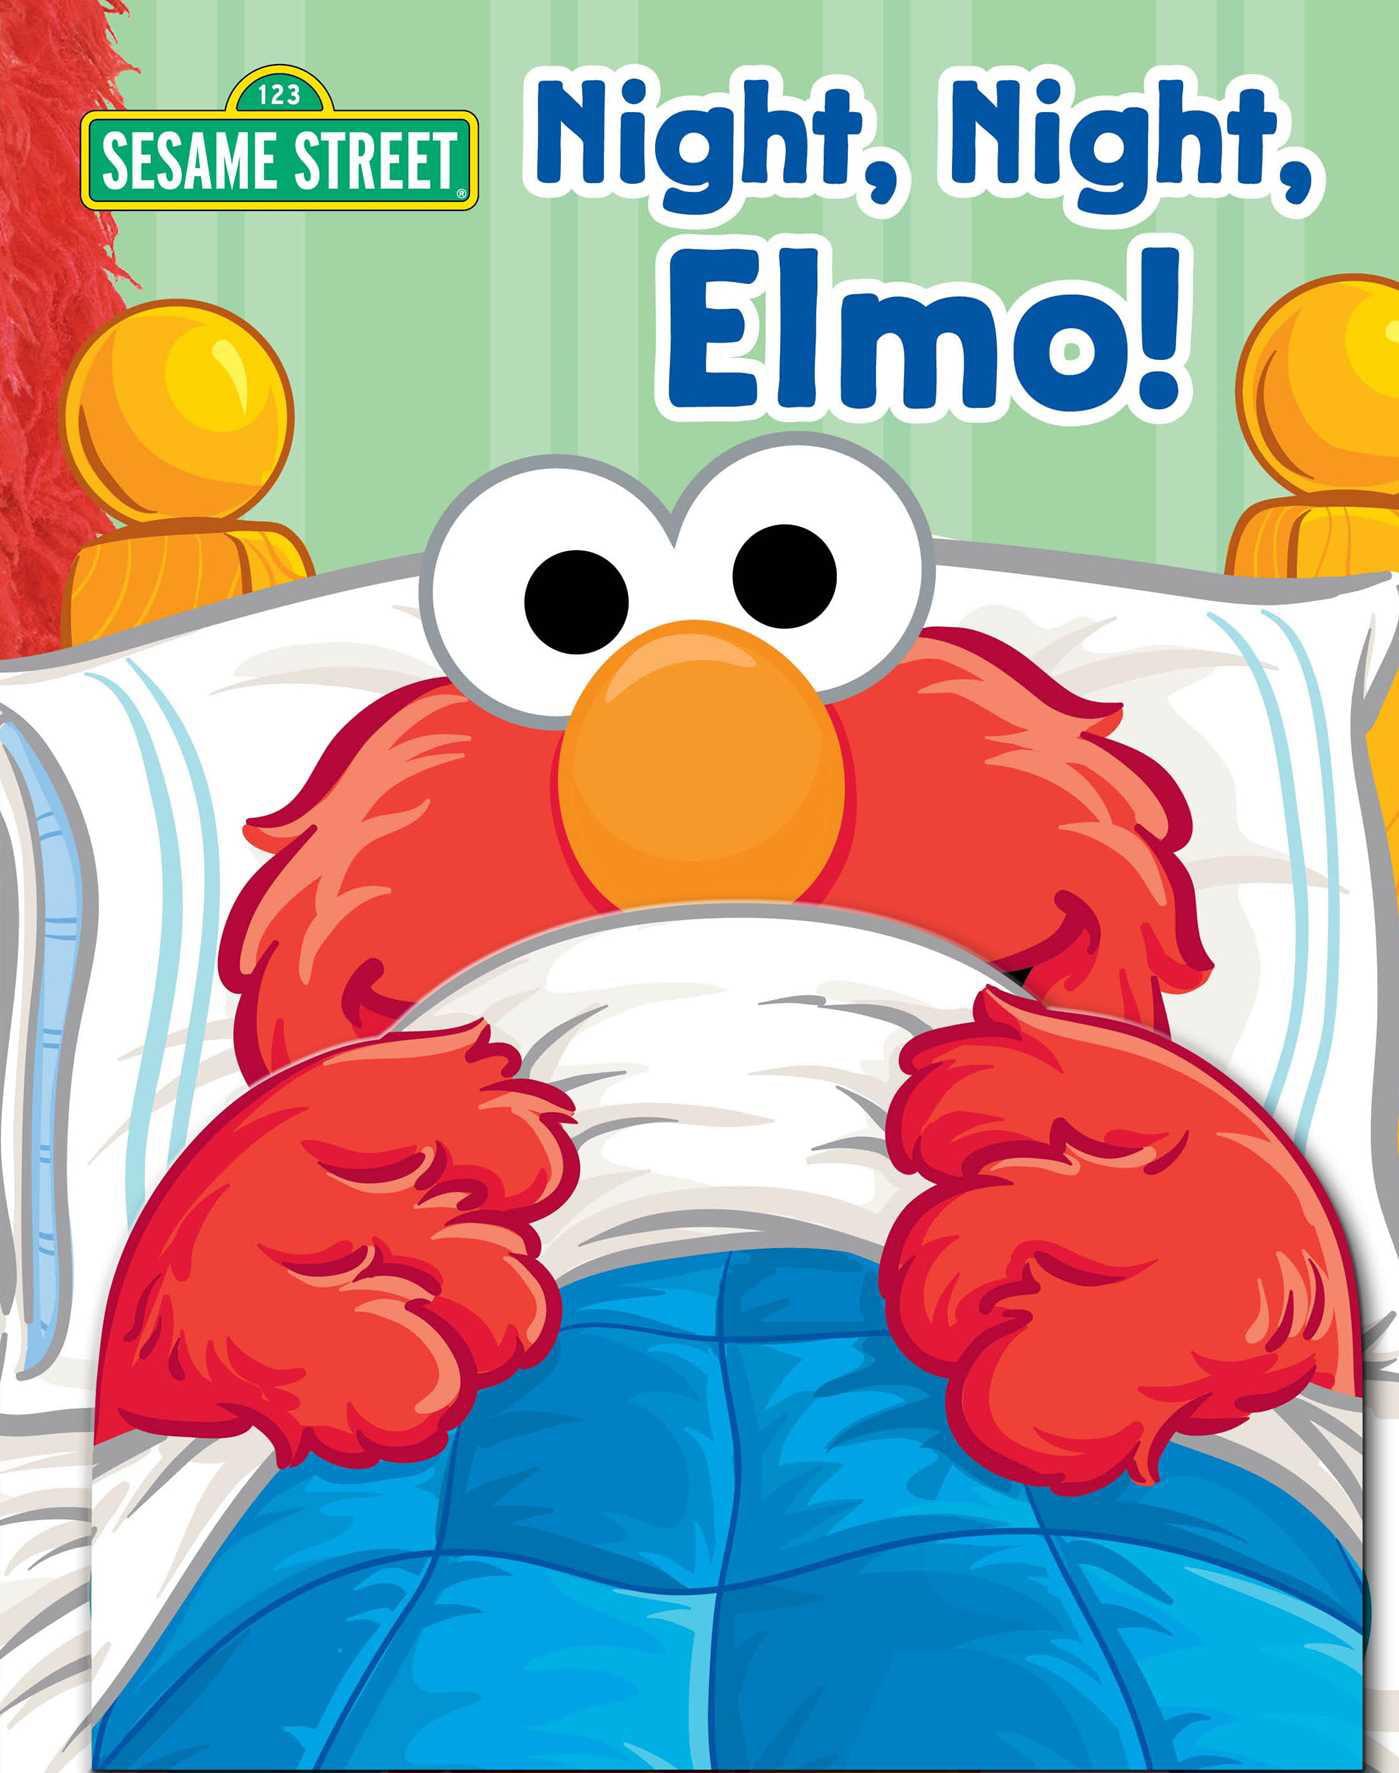 sc 1 st  Walmart & Night Night Elmo! - Walmart.com